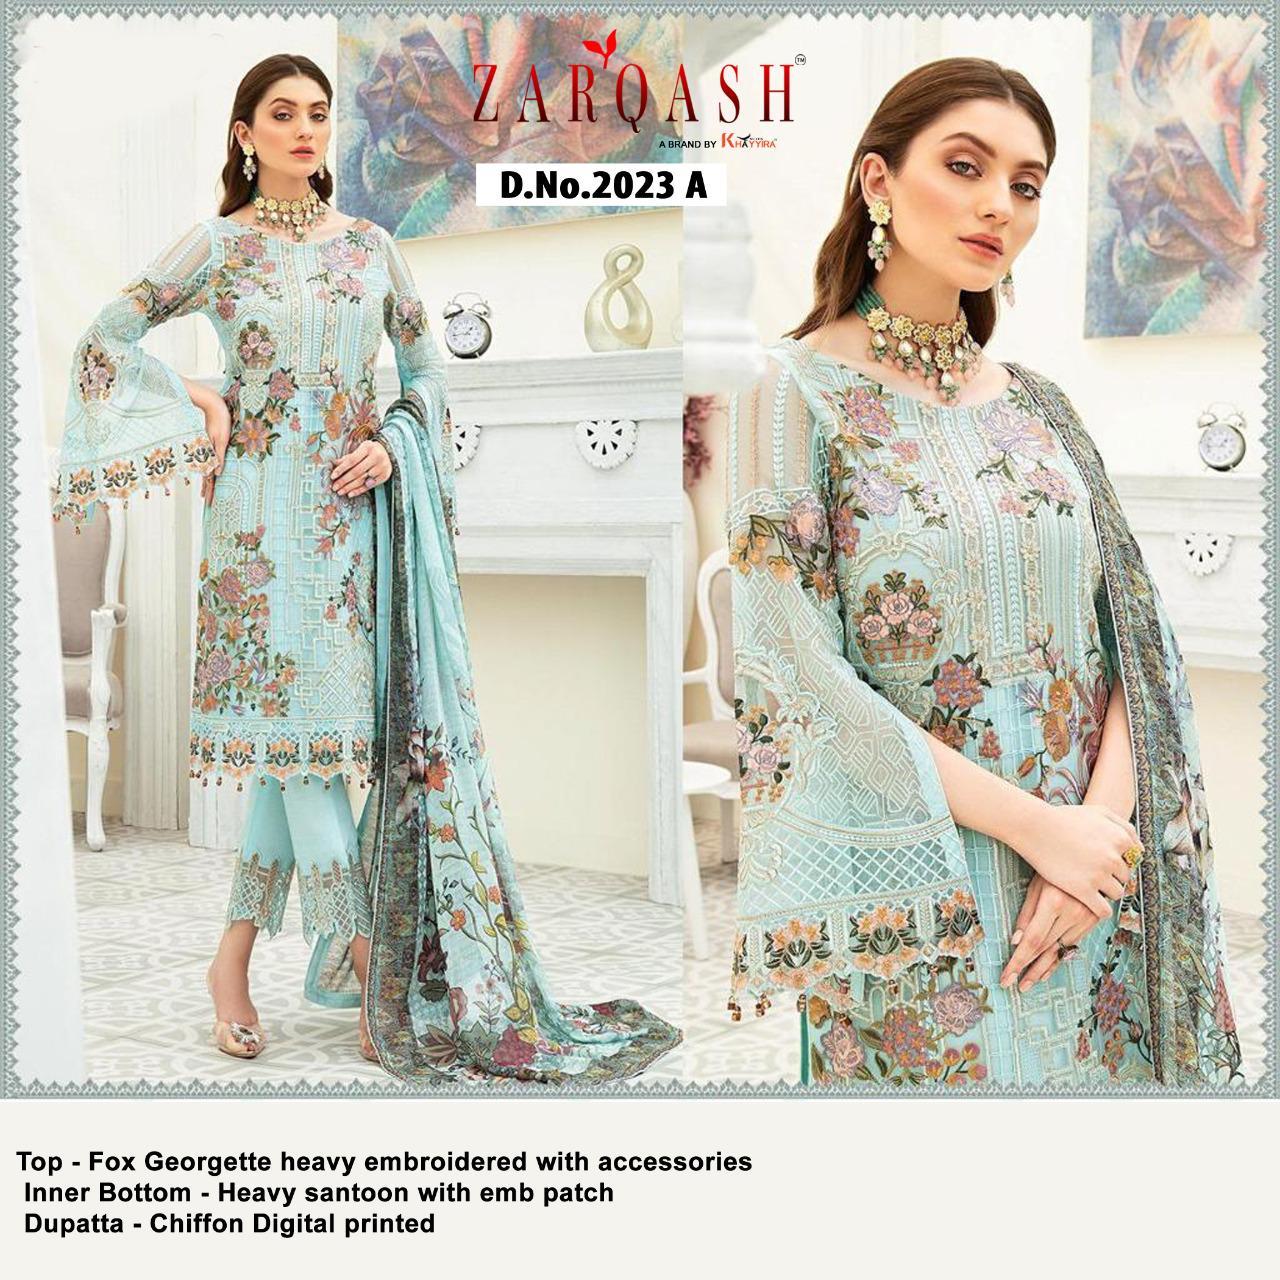 Zarqash Dynamic by Khayyira Salwar Suit Wholesale Catalog 4 Pcs 2 - Zarqash Dynamic by Khayyira Salwar Suit Wholesale Catalog 4 Pcs